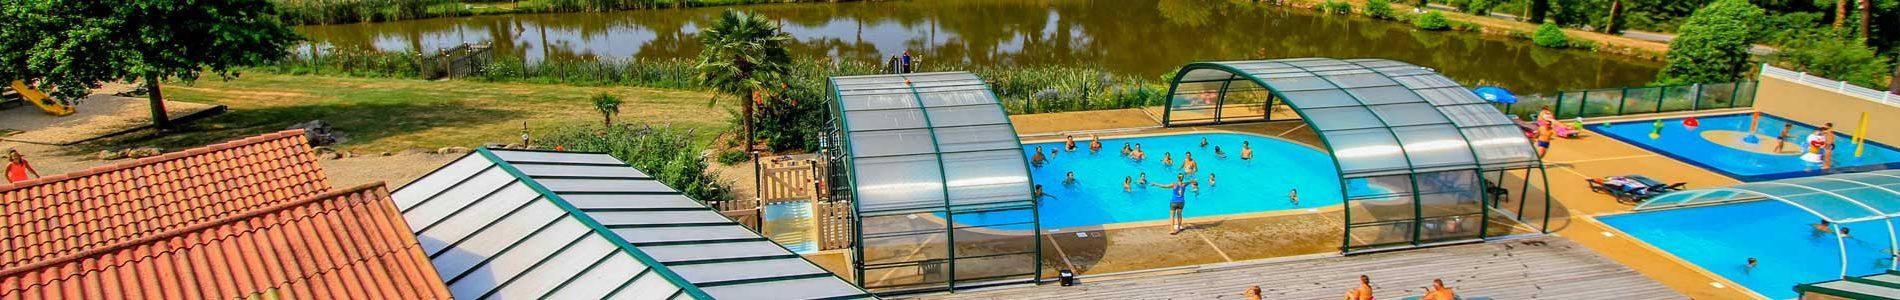 camping en vendée piscine